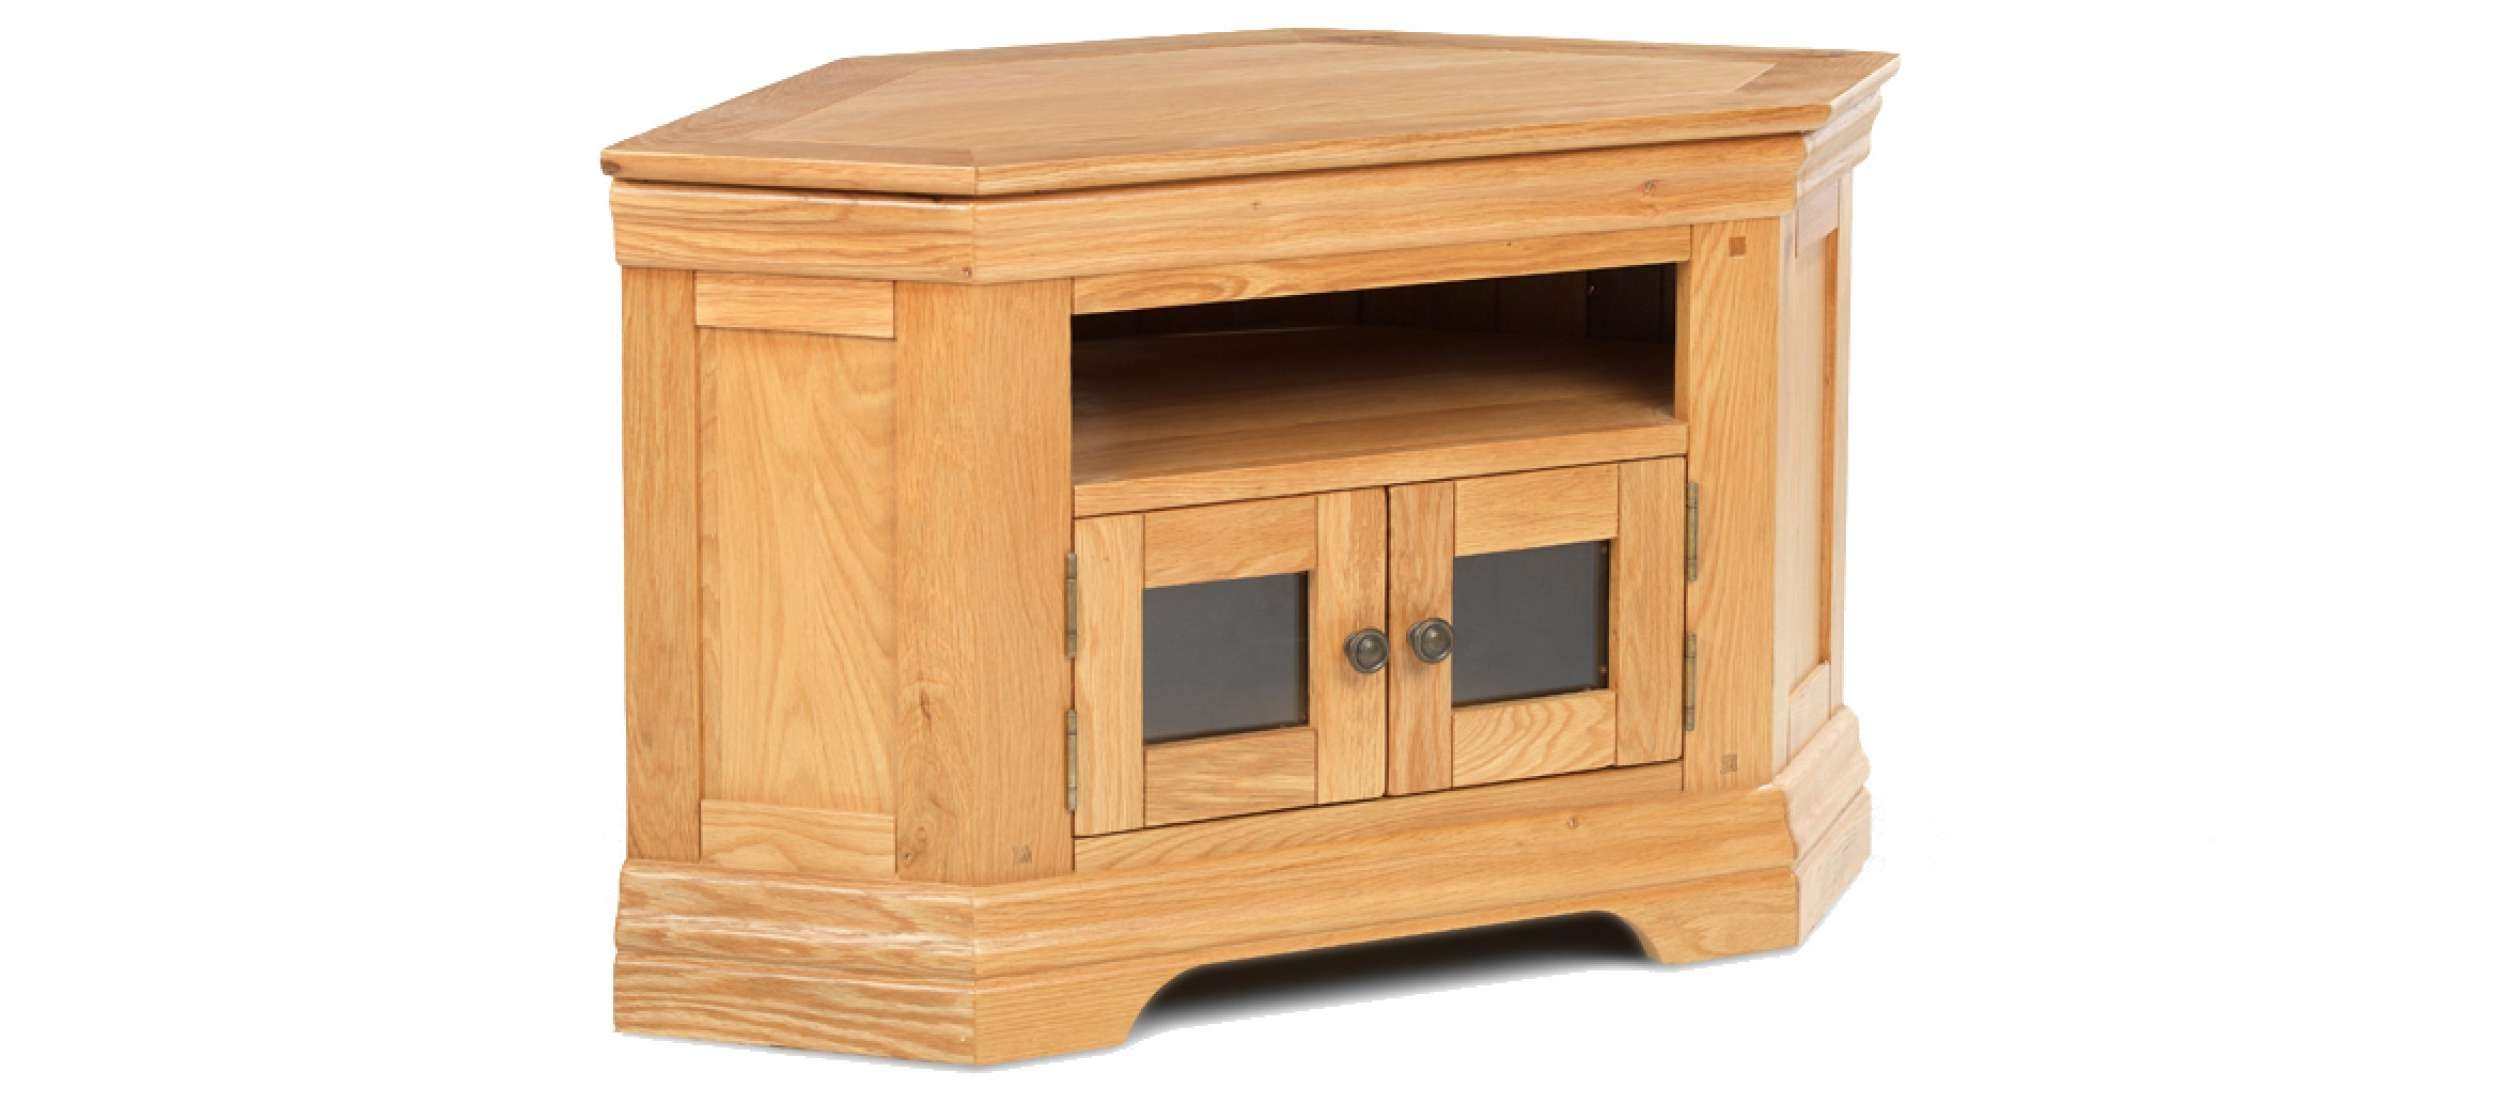 Constance Oak Corner Tv Cabinet | Quercus Living Inside Rustic Corner Tv Cabinets (View 13 of 20)